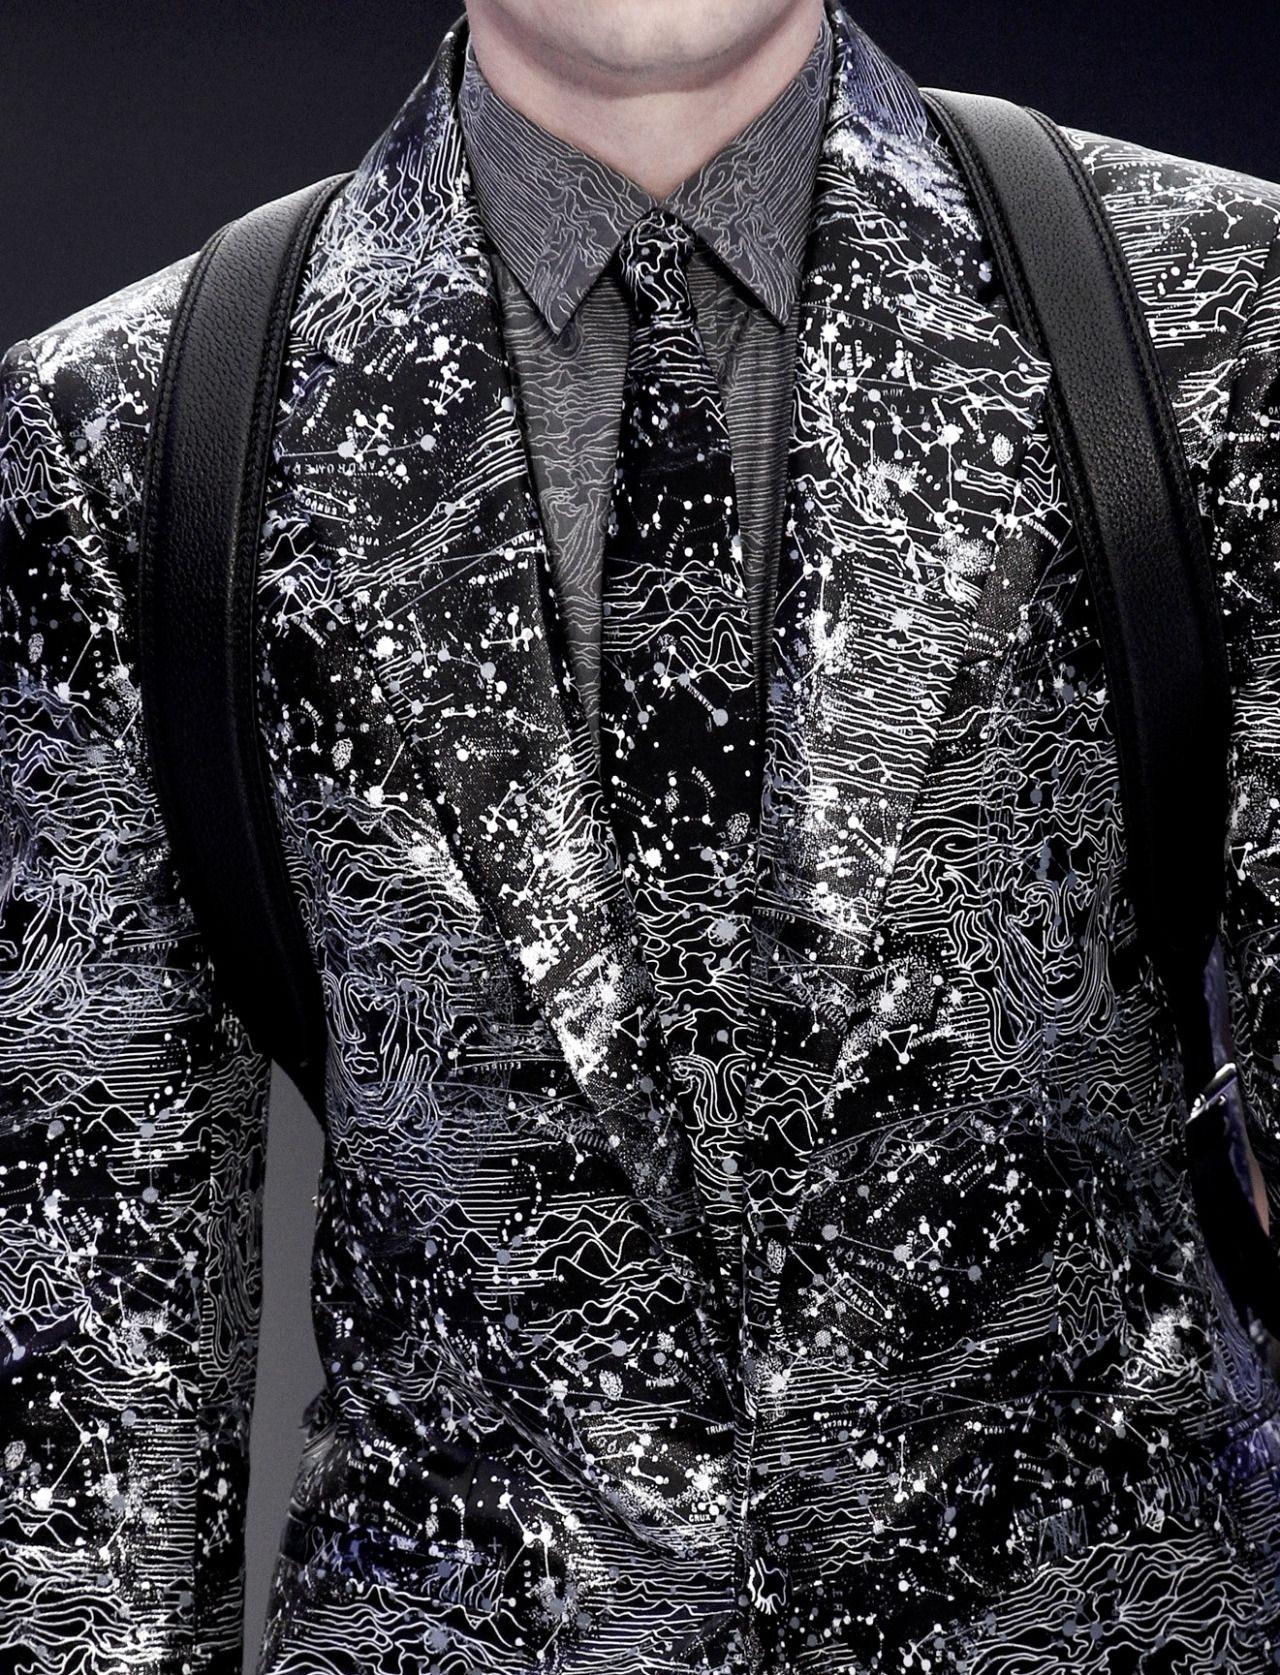 Versace FW16 | Mens accessories fashion, Fashion, Versace men